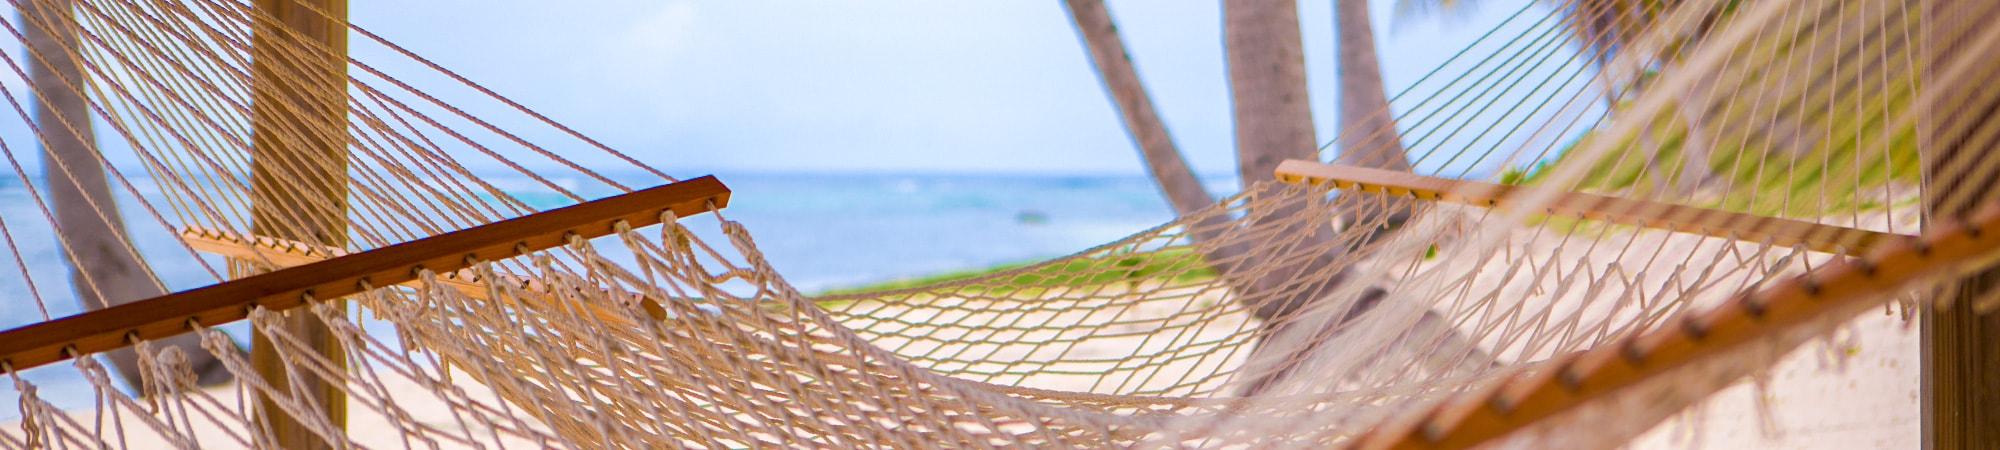 Cayman Brac Beach Resort Reviews